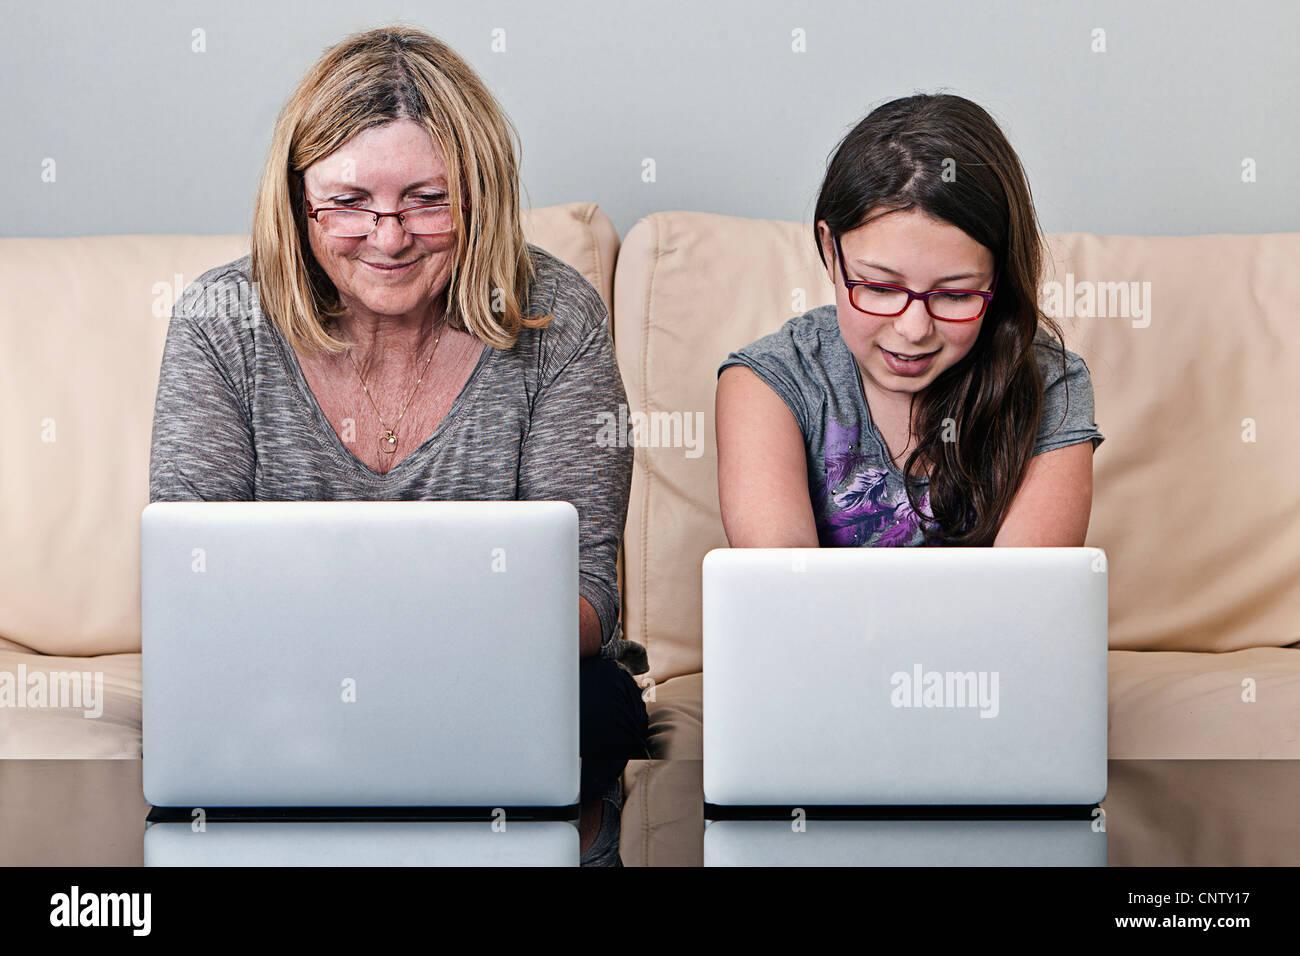 Großmutter und Enkelin mit Laptops Stockbild